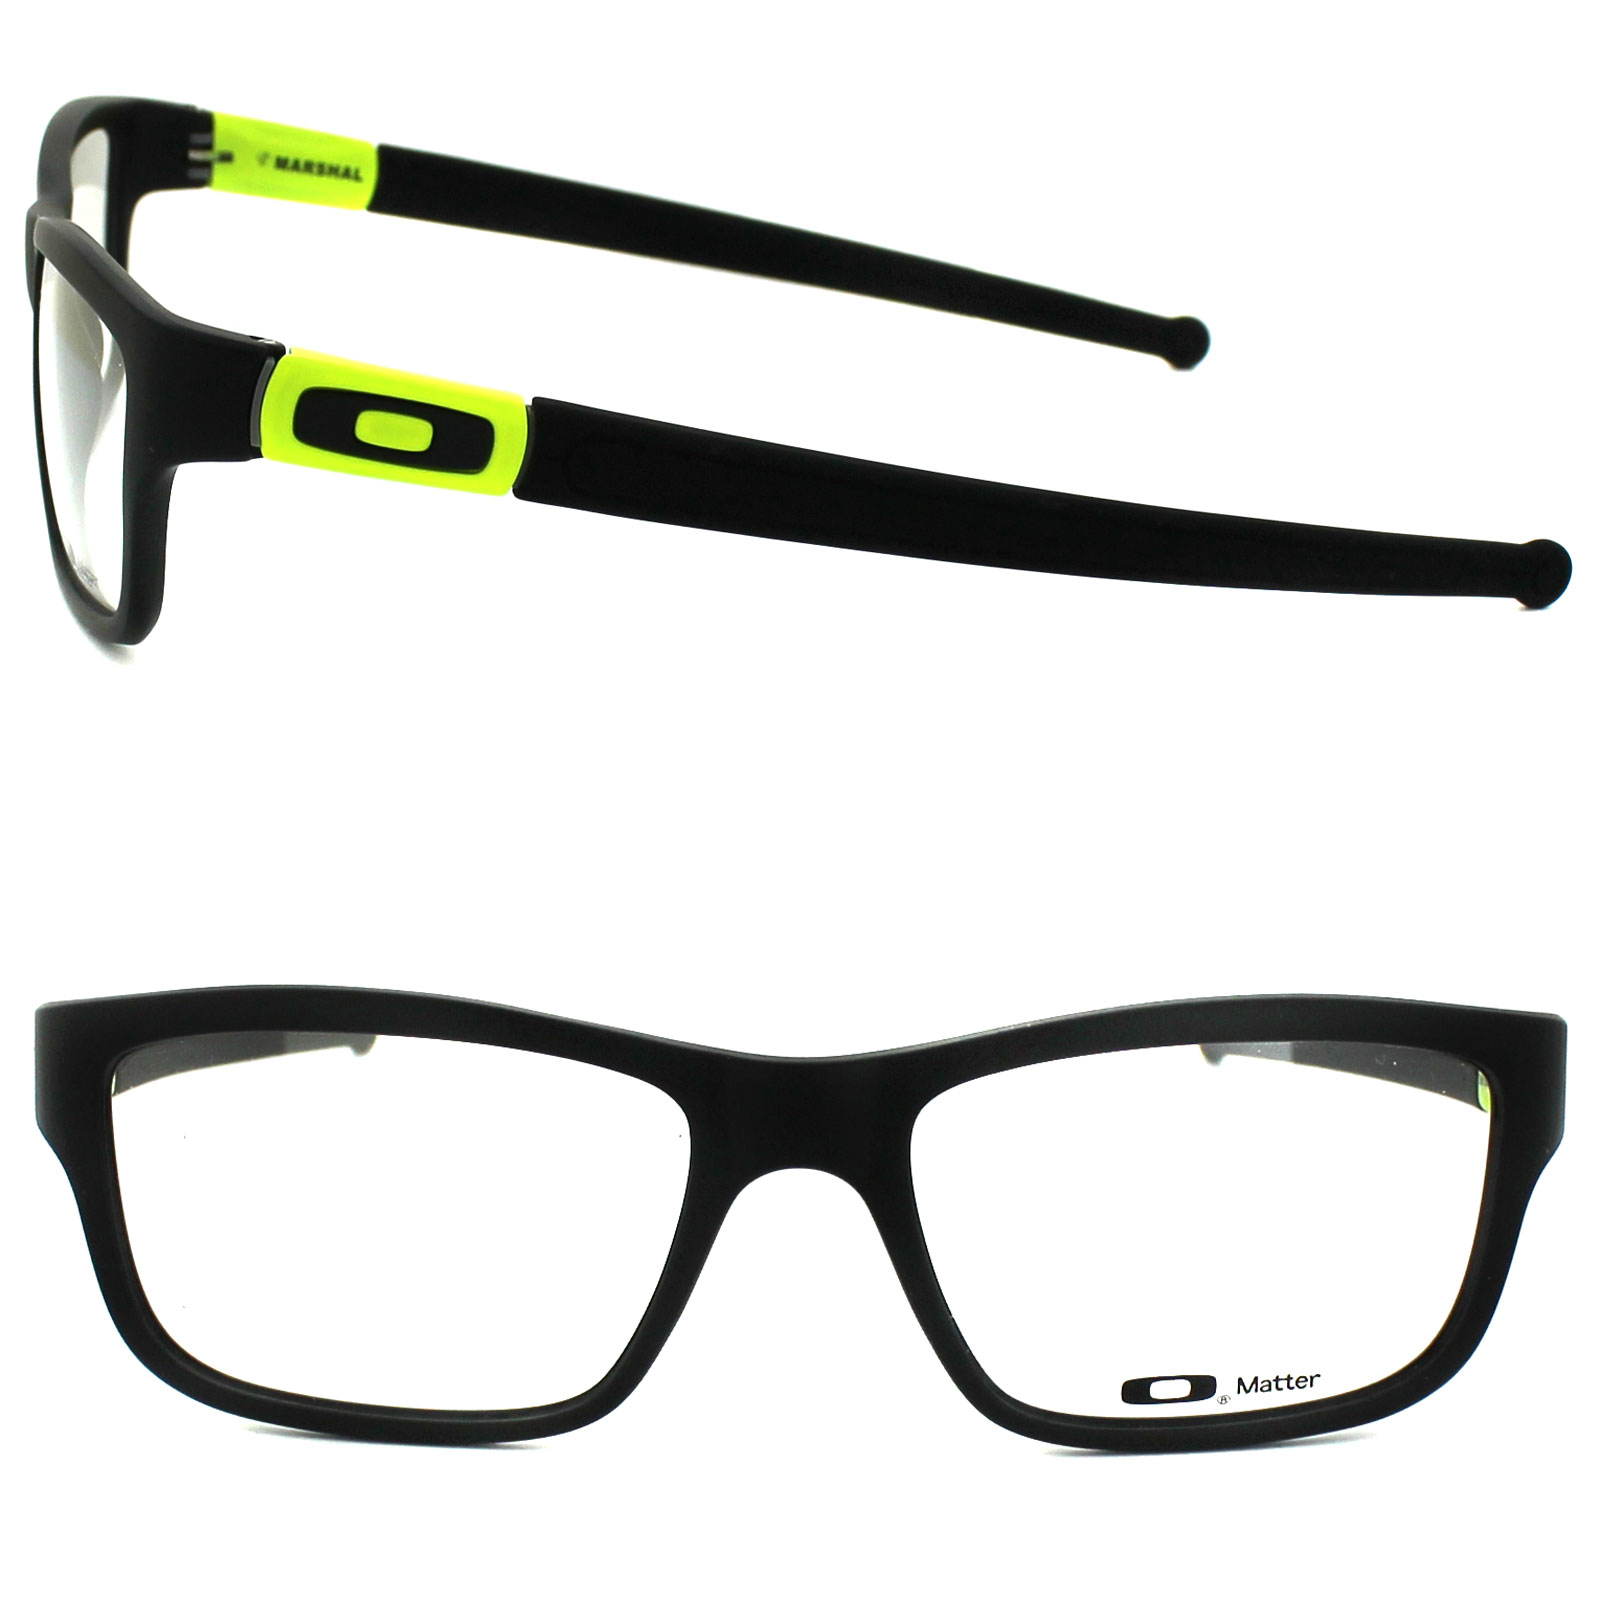 cff77a28d34 Oakley Marshal Prescription Glasses « Heritage Malta